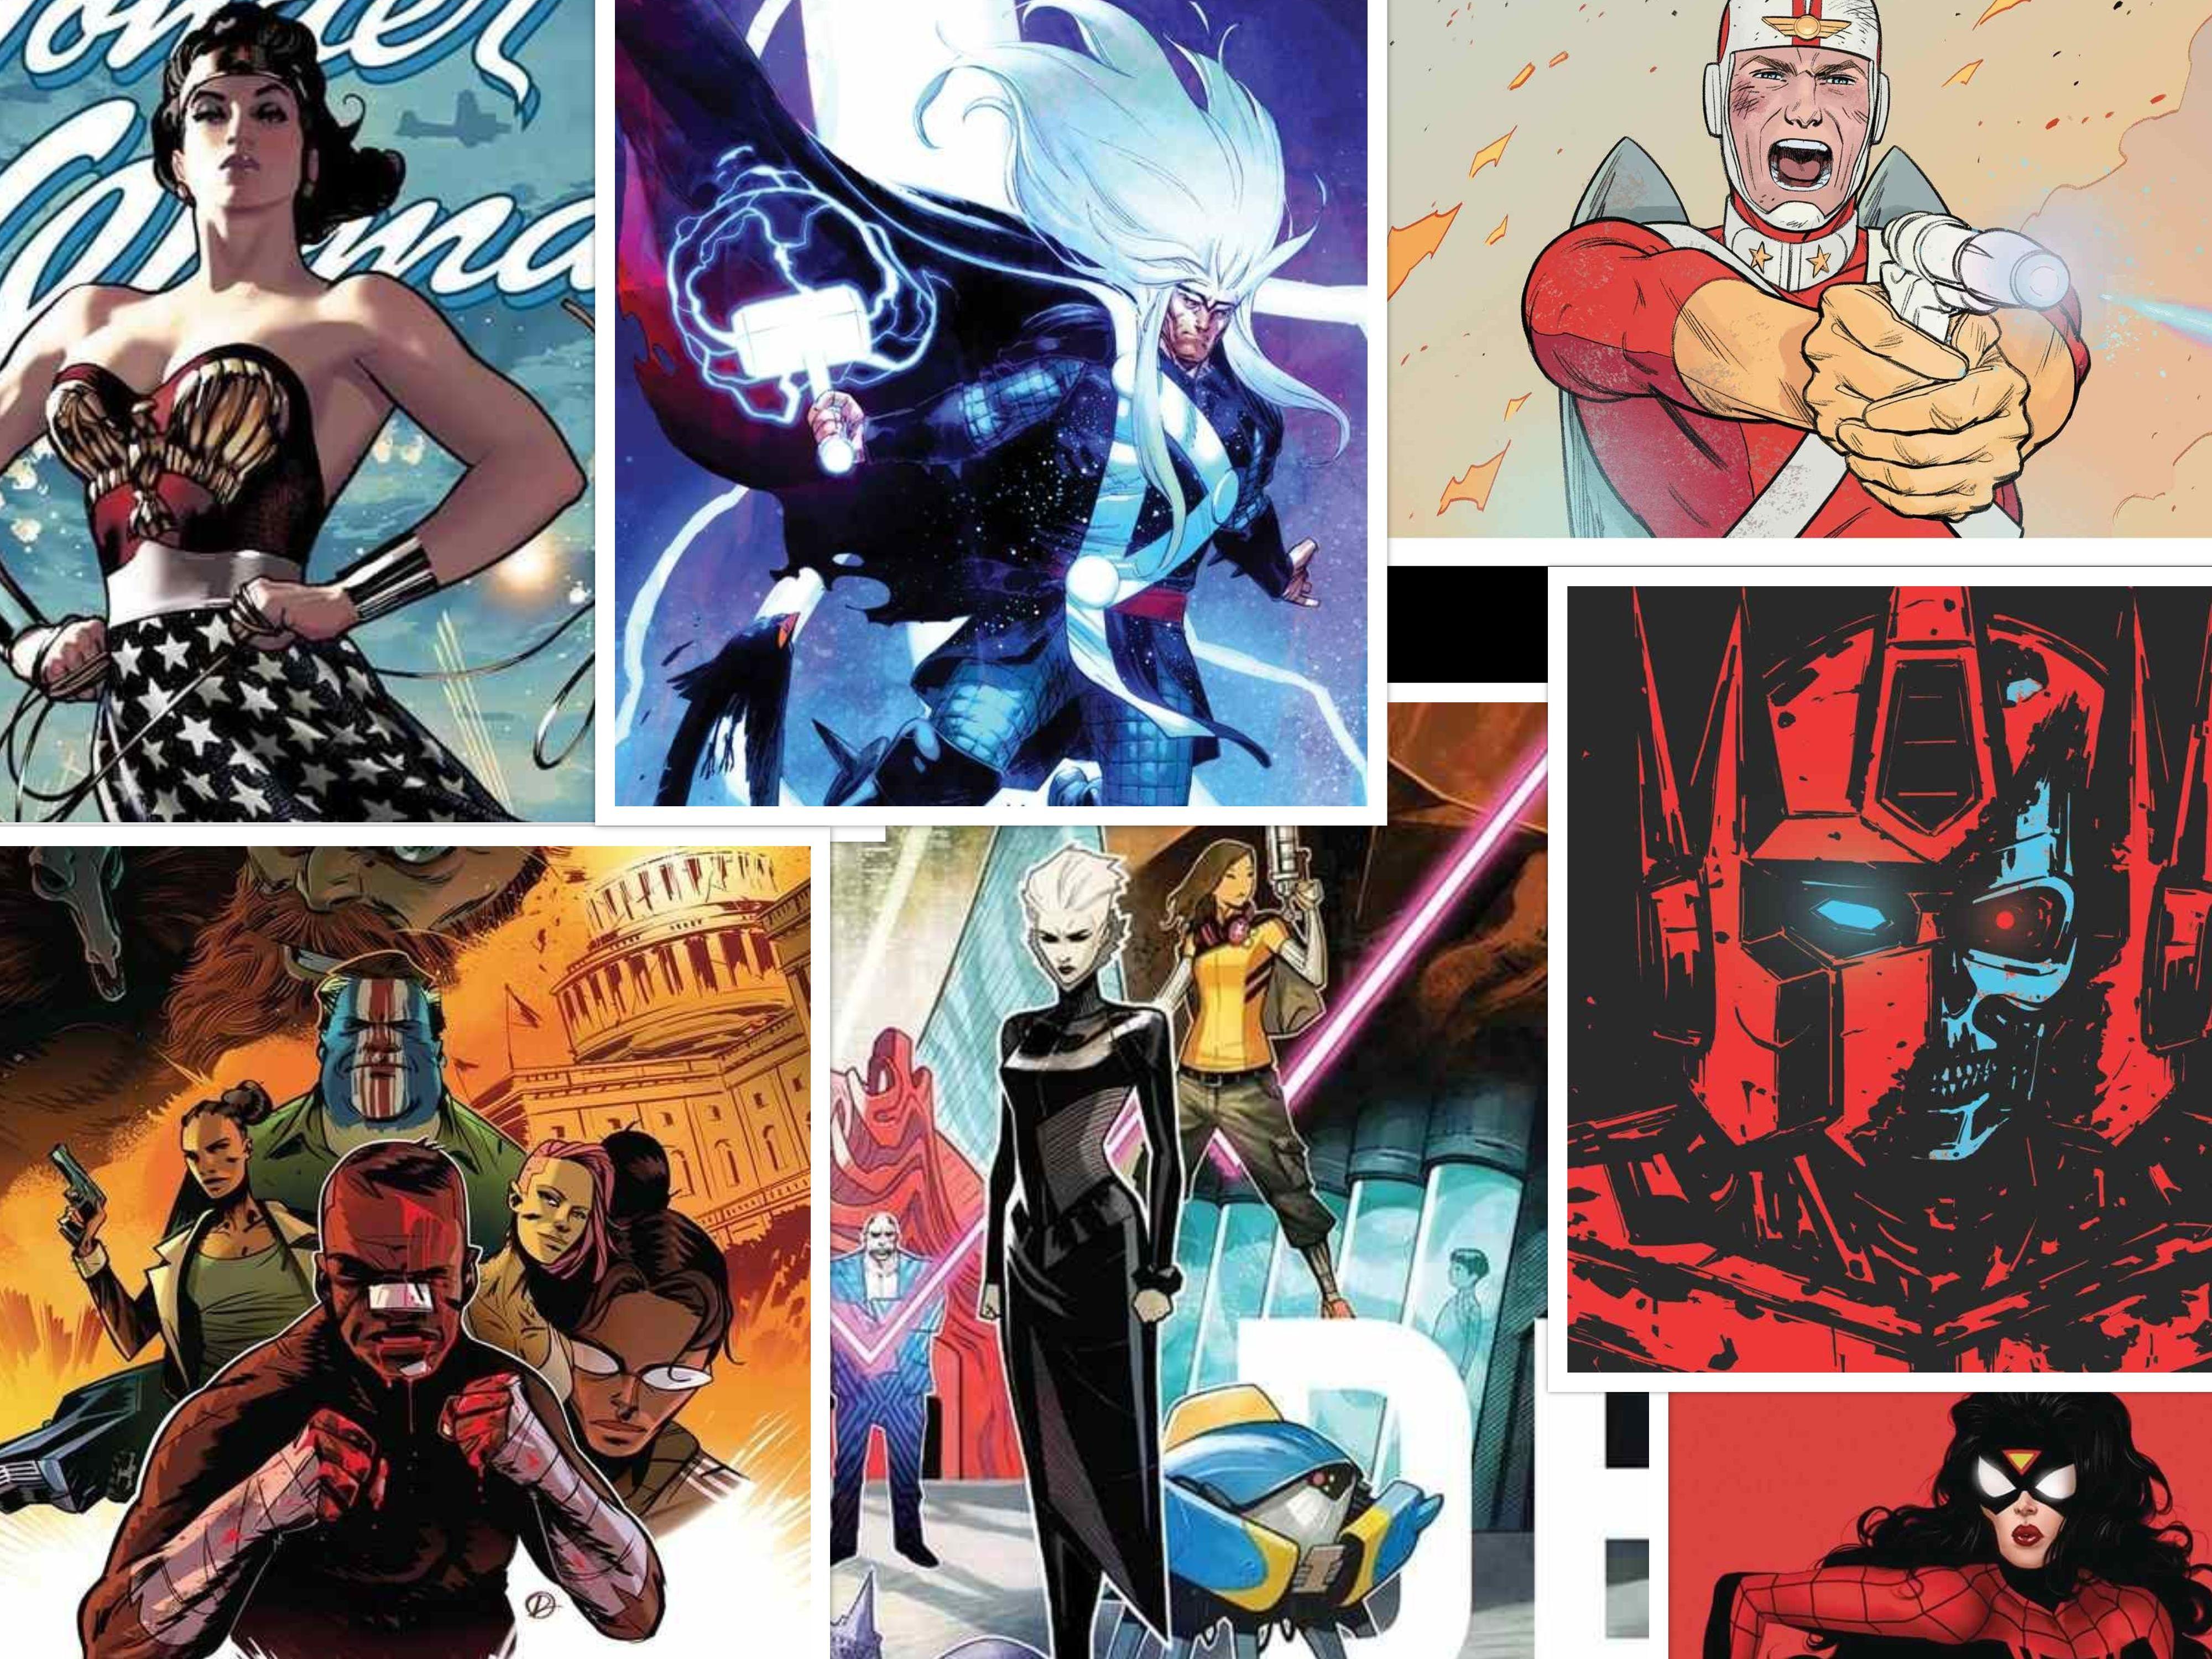 Big Hero Comic 2020 comic book preview: 10 comics you need to read